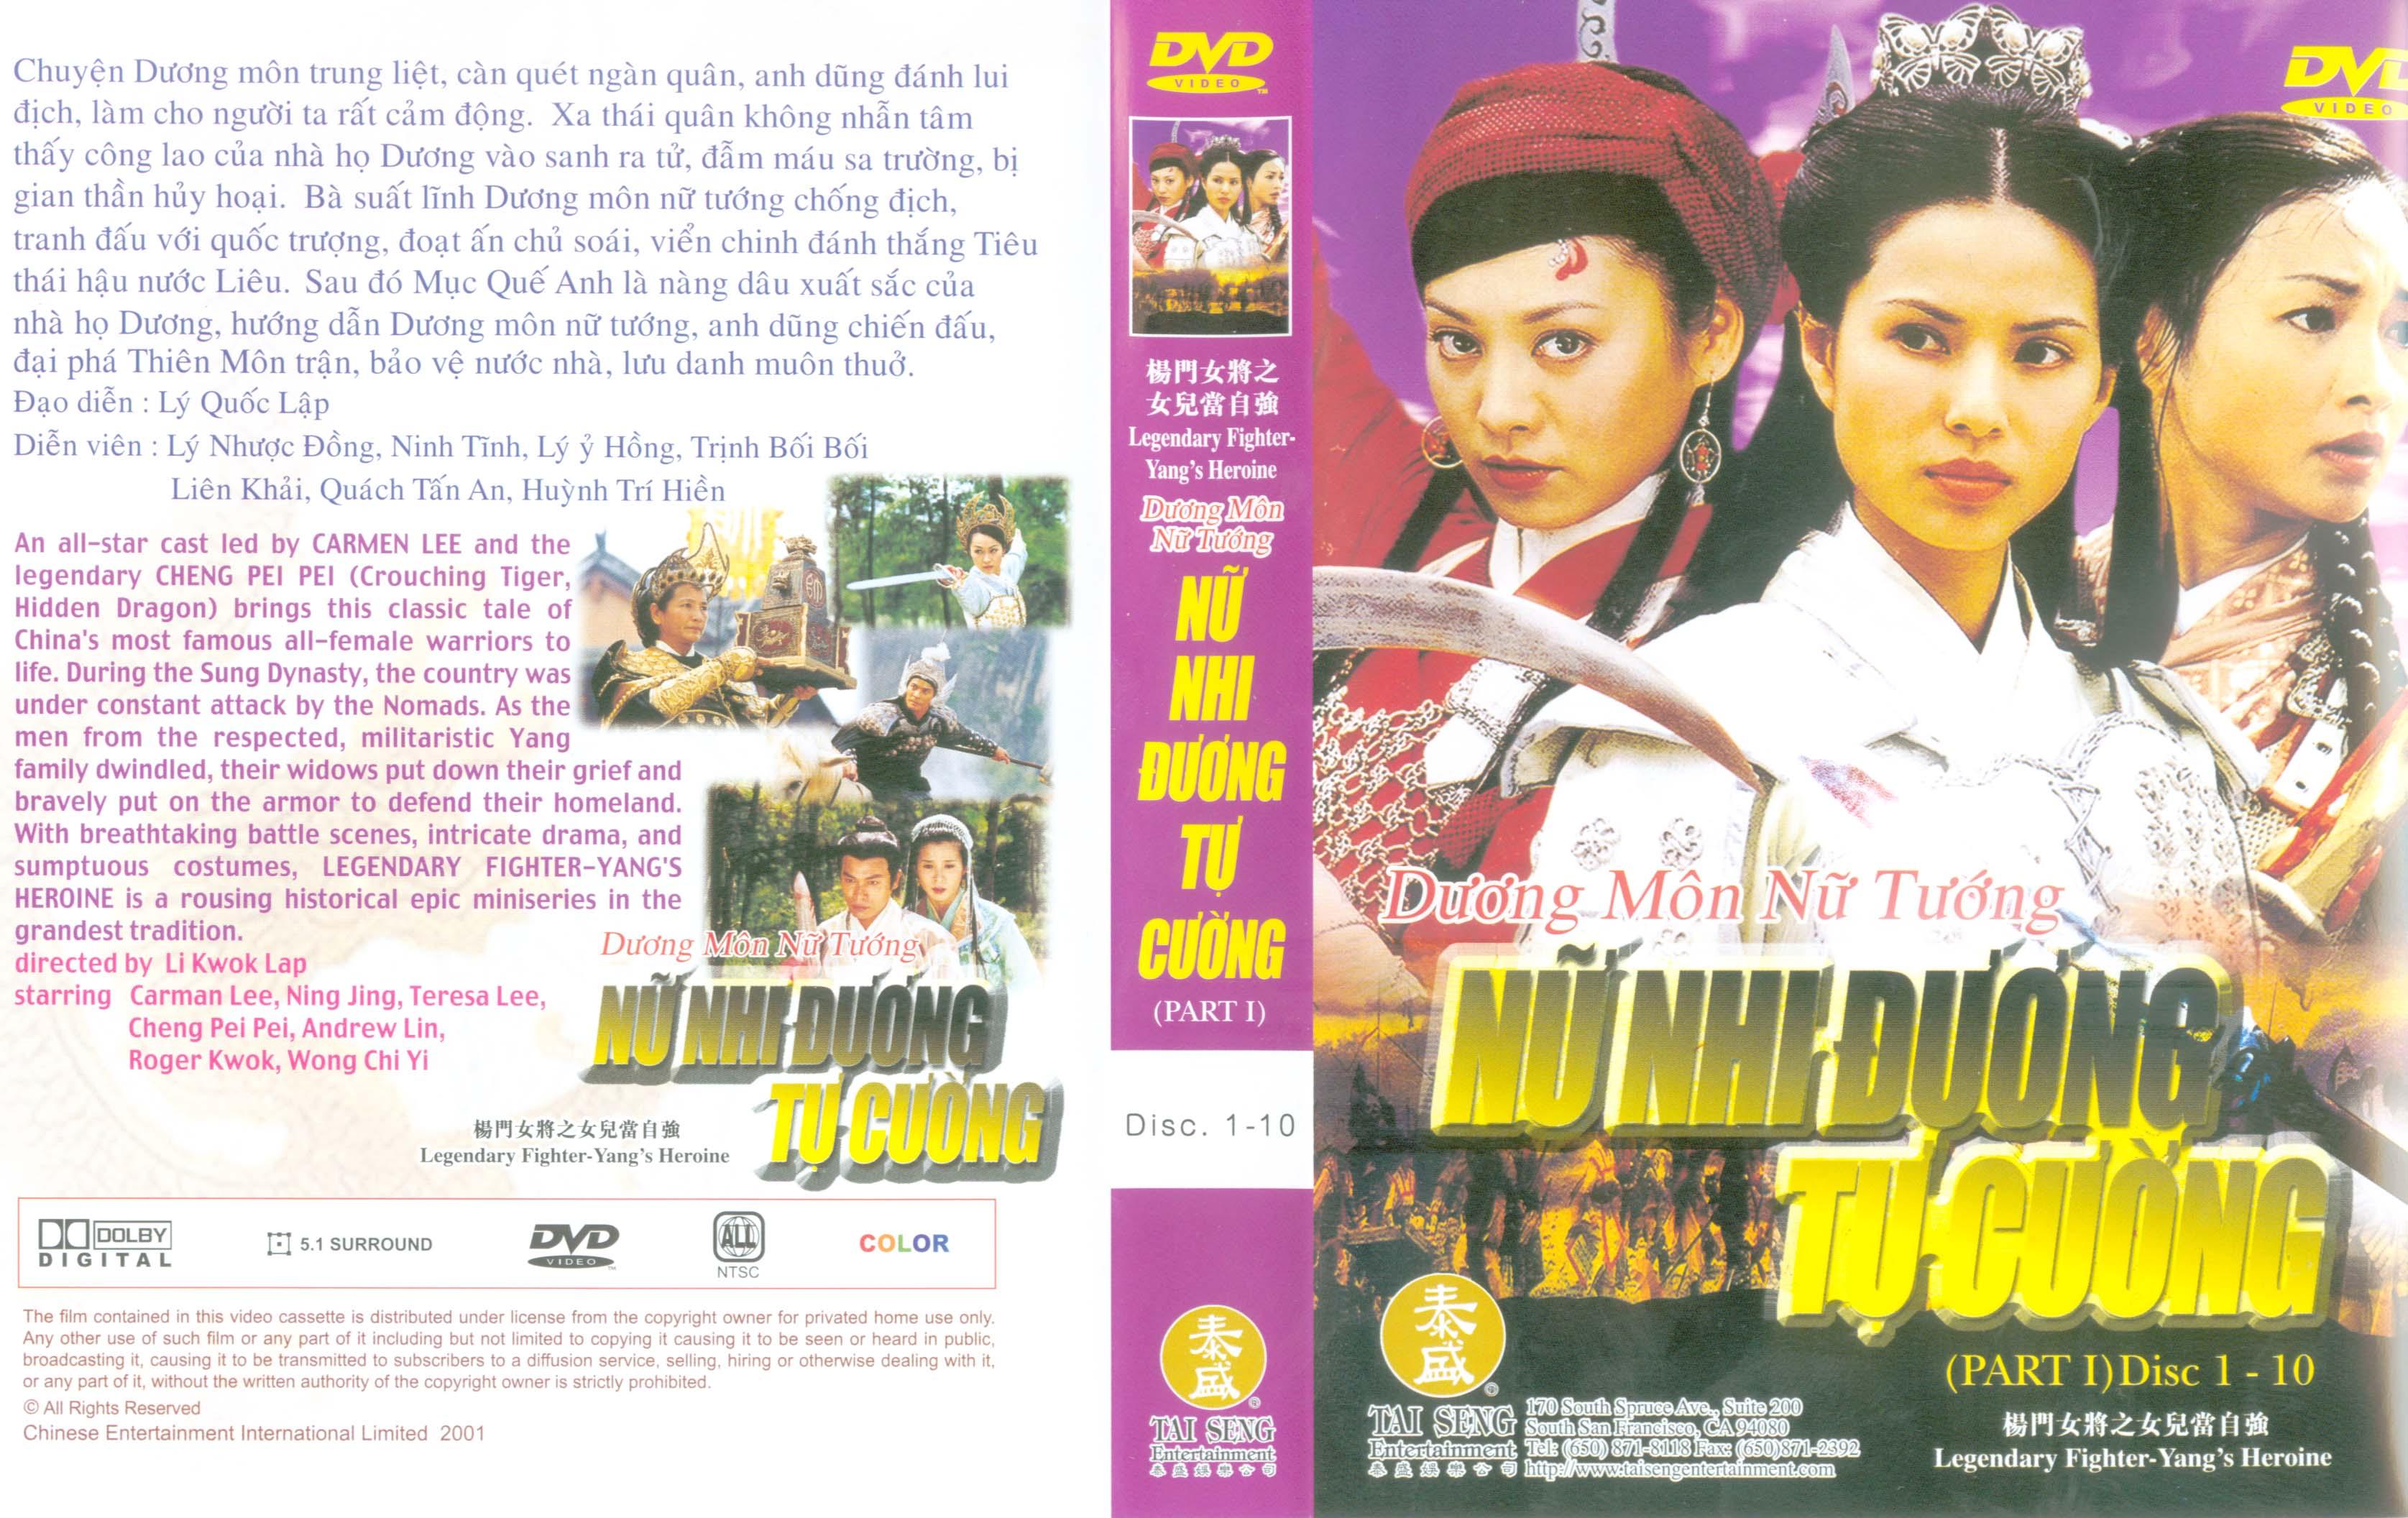 Duong Mon Ho Tuong (11 DVD)